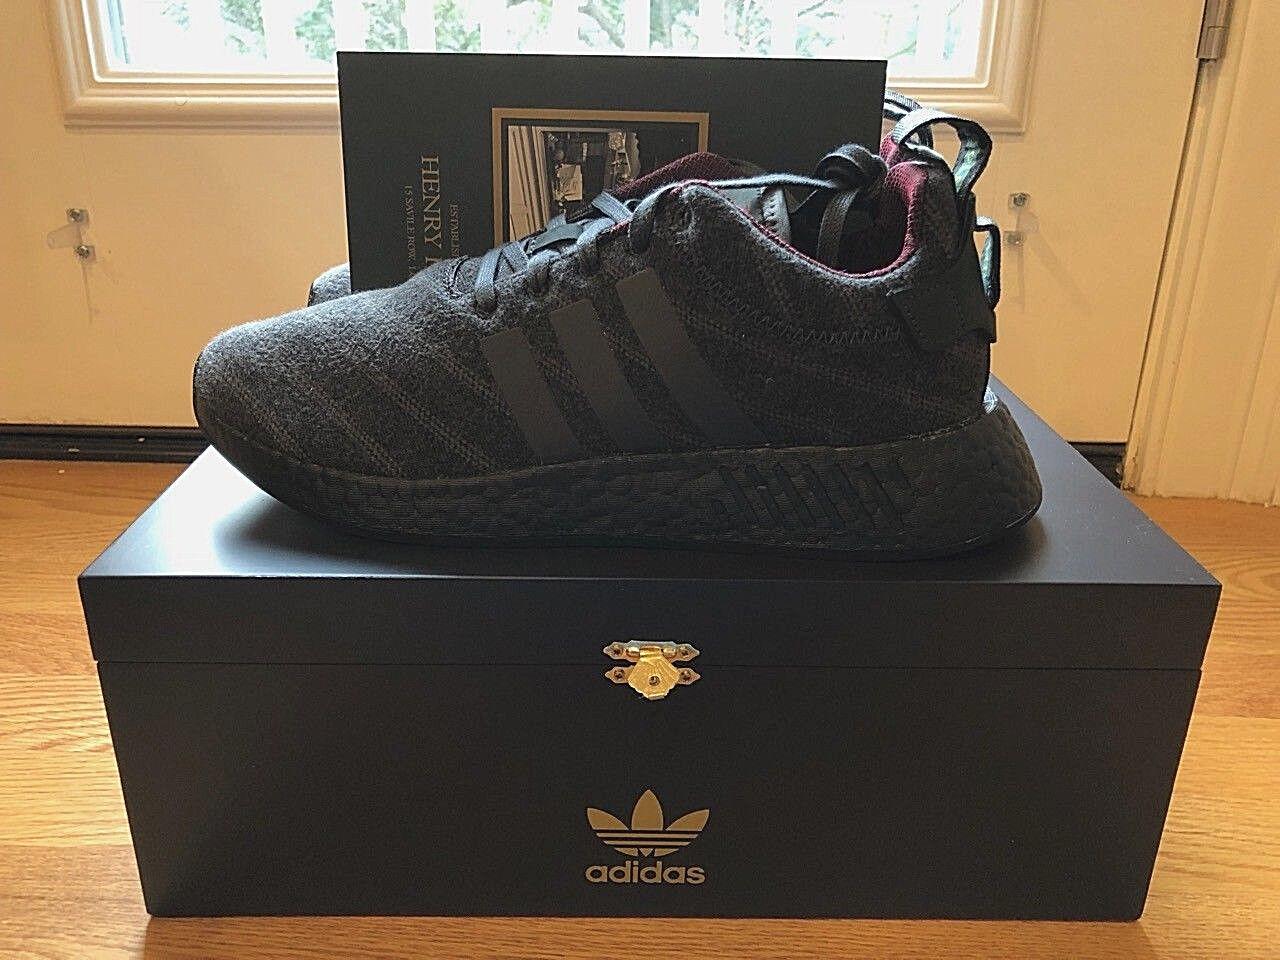 Adidas X Henry Poole X Size? NMD R2 US 8.5, 9.5 Saville Row Shoe